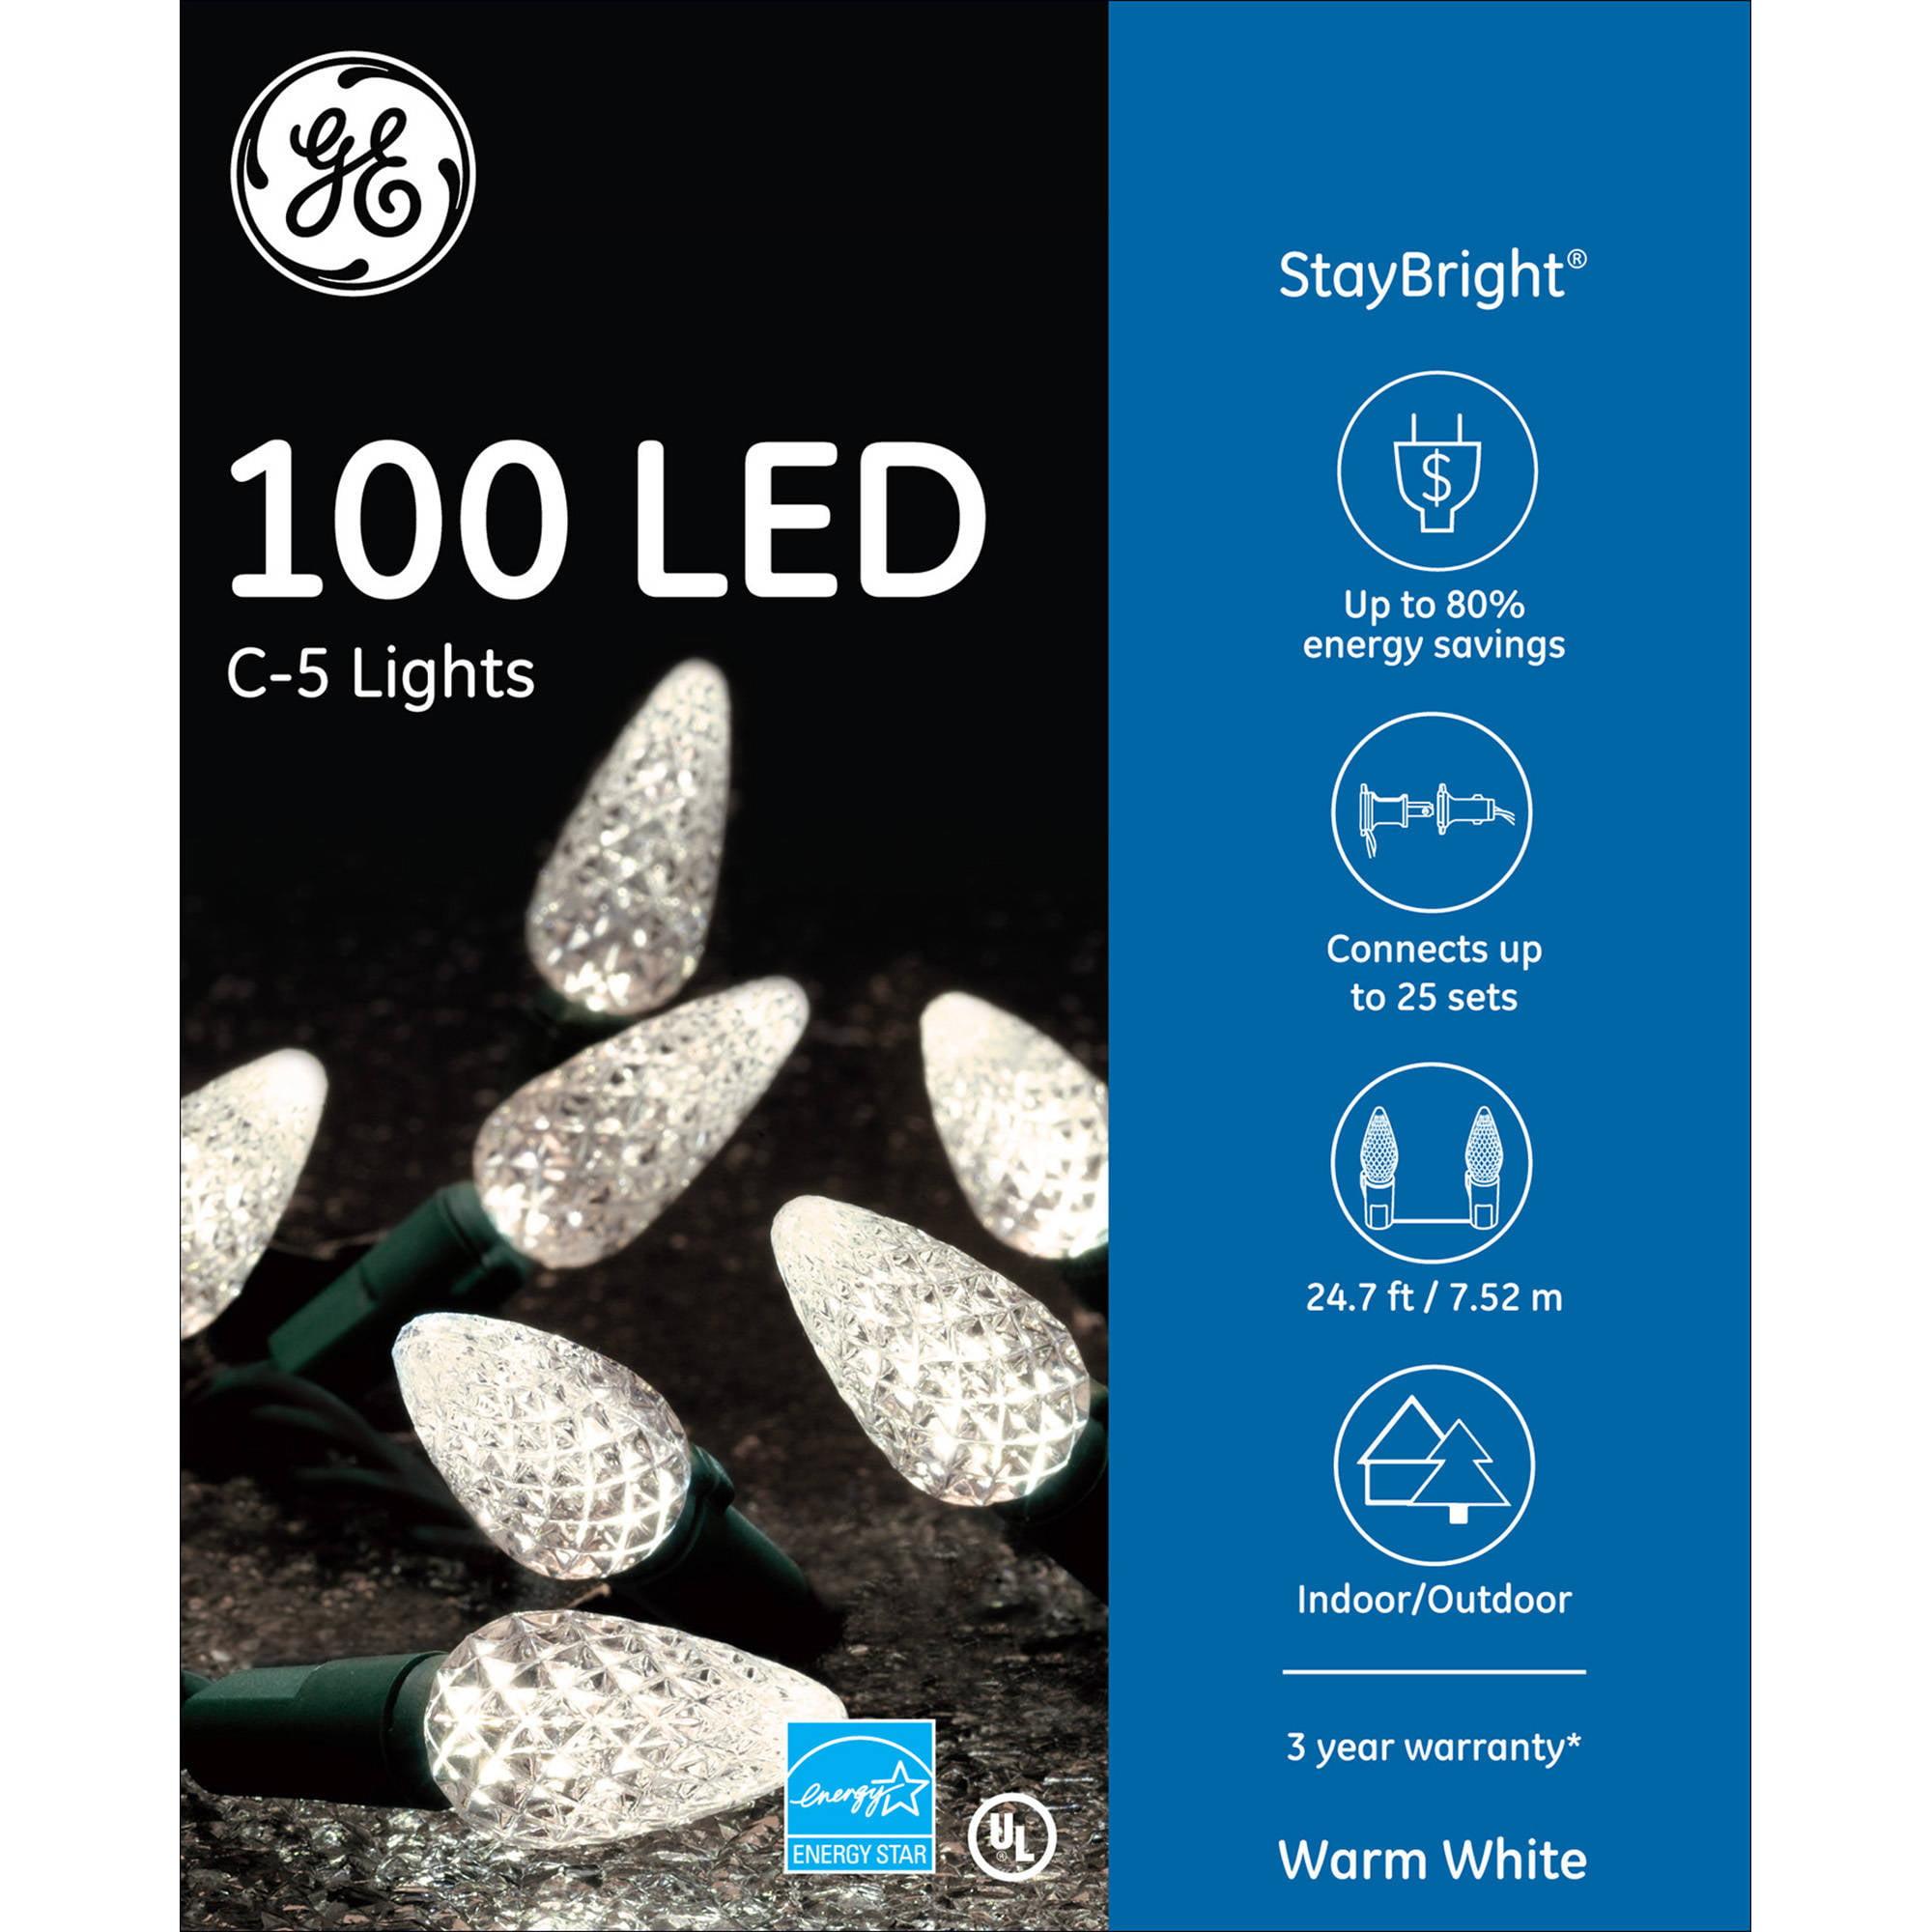 Ge Led Christmas Lights.Ge 100ct Staybright C5 Led Christmas Light String Set Multi Color